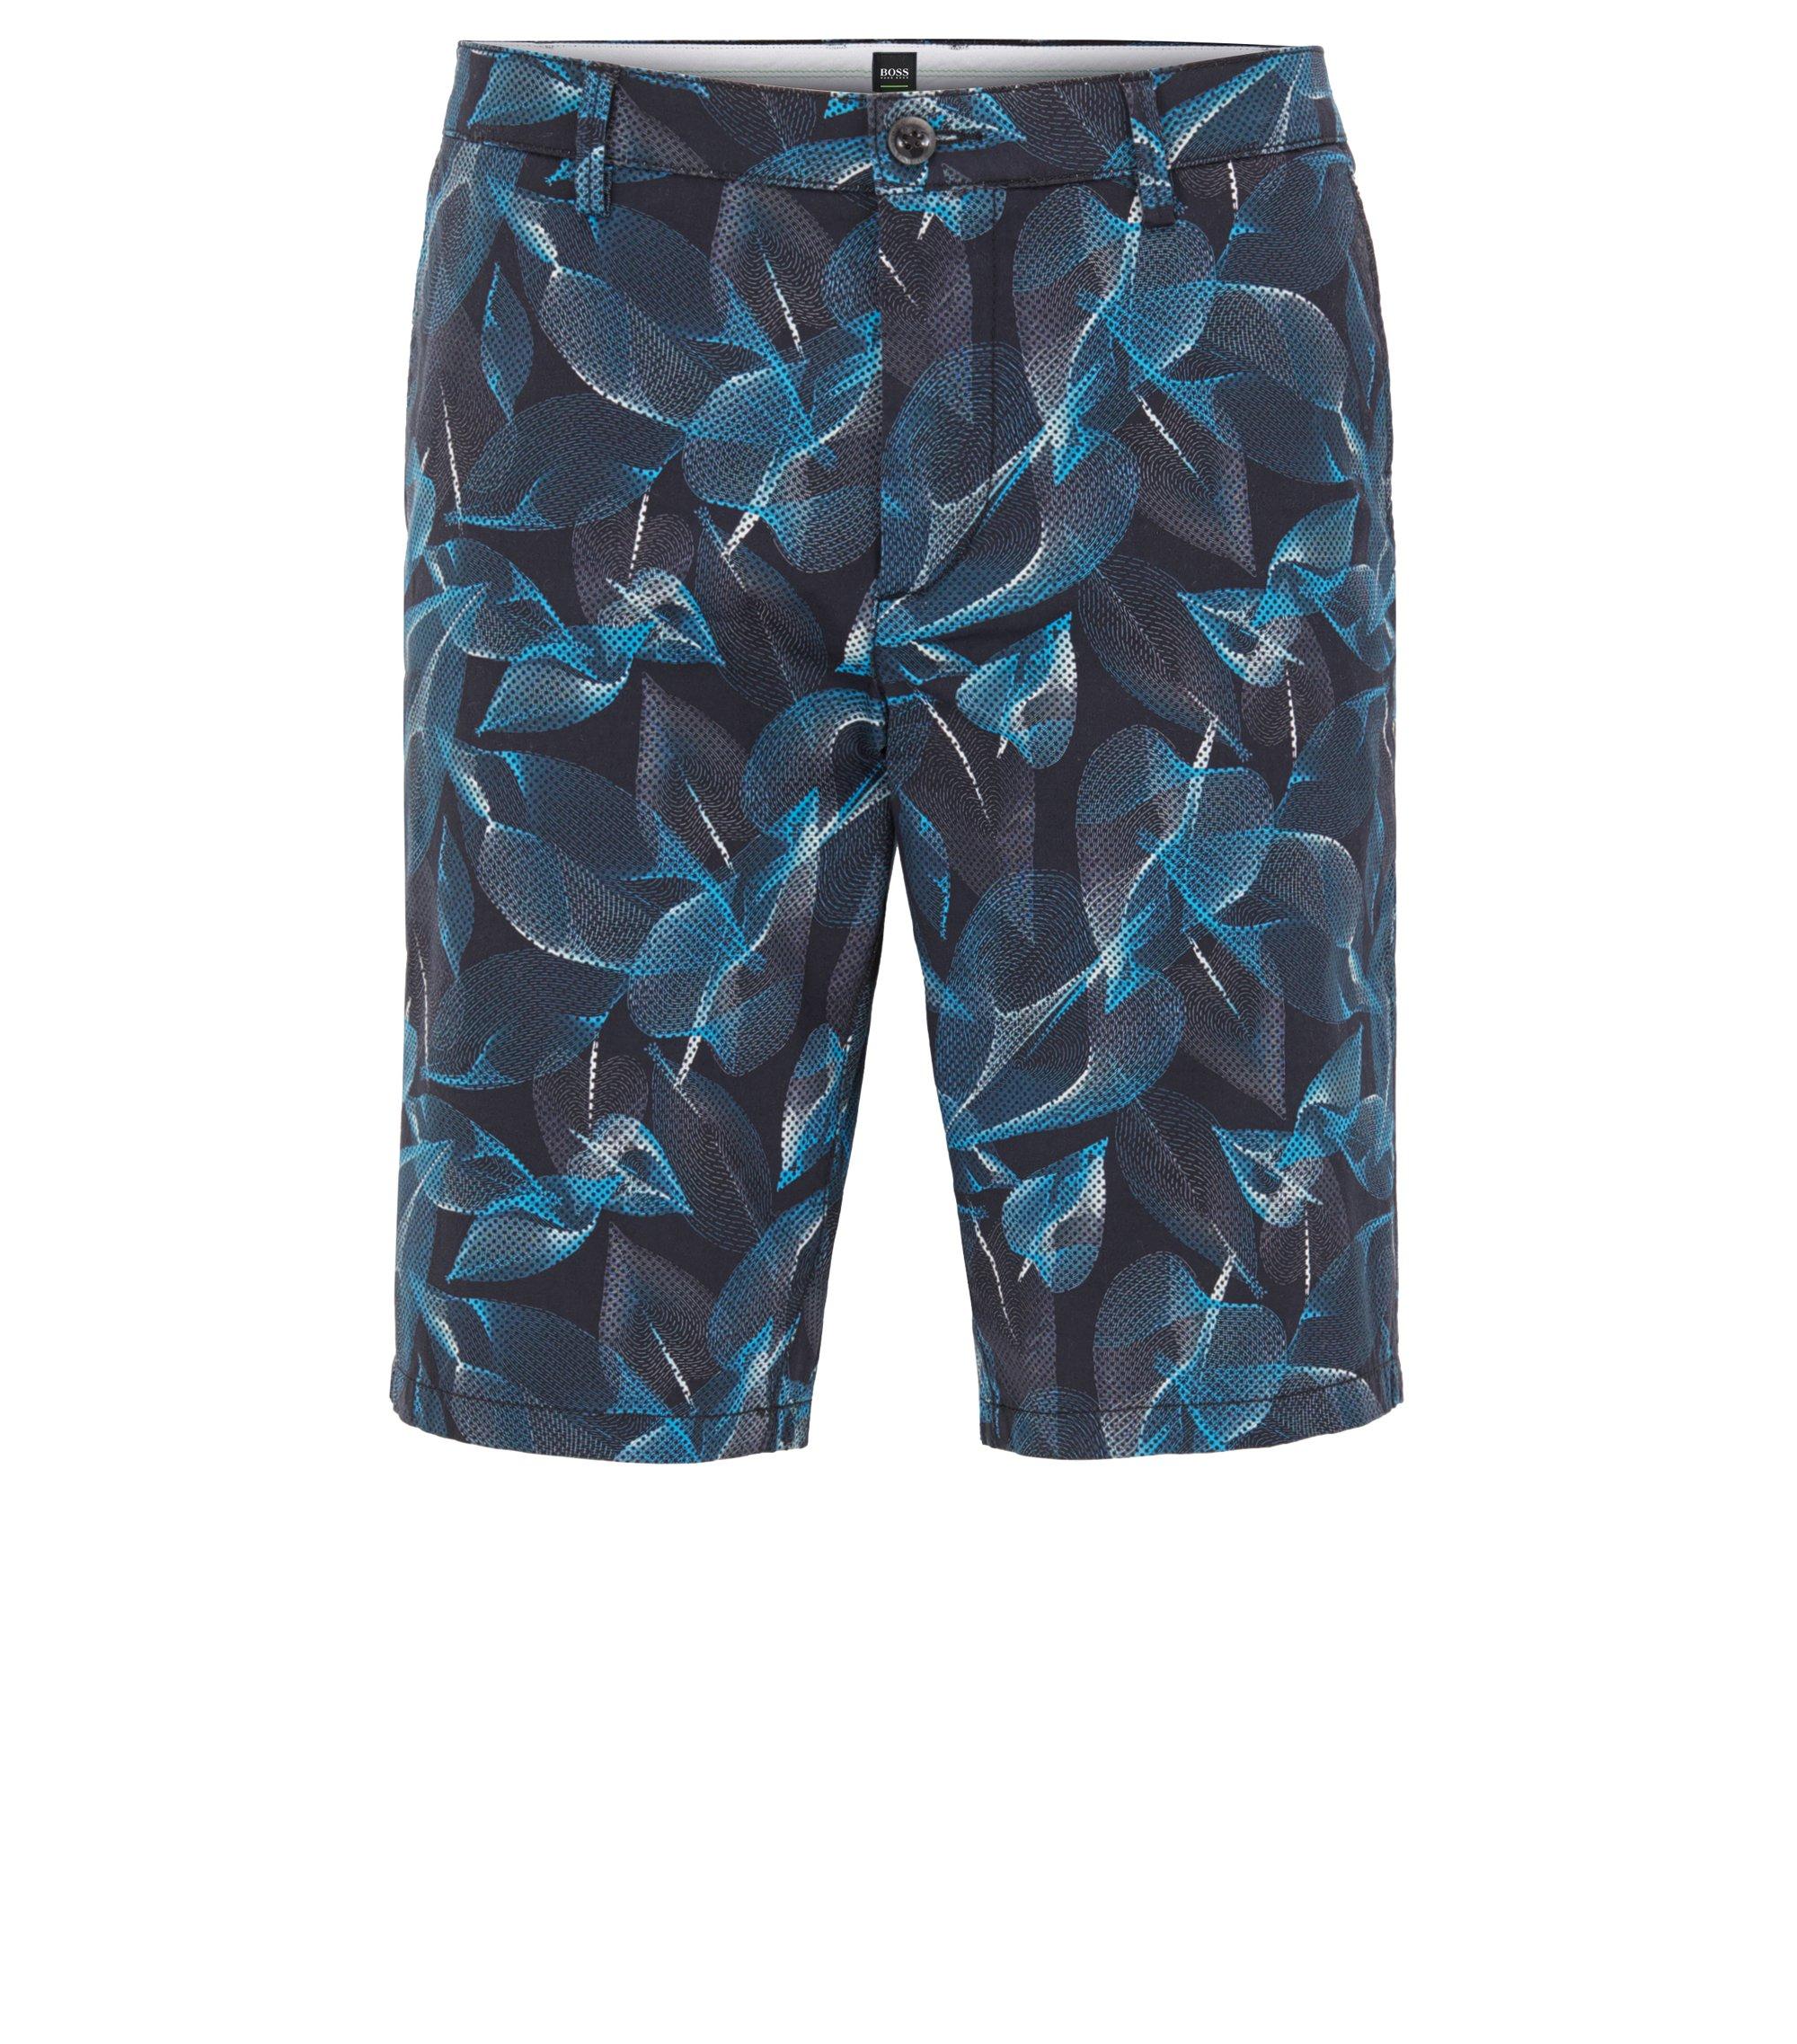 Printed Sateen Stretch Cotton Short, Slim Fit   Liem Print W, Open Blue